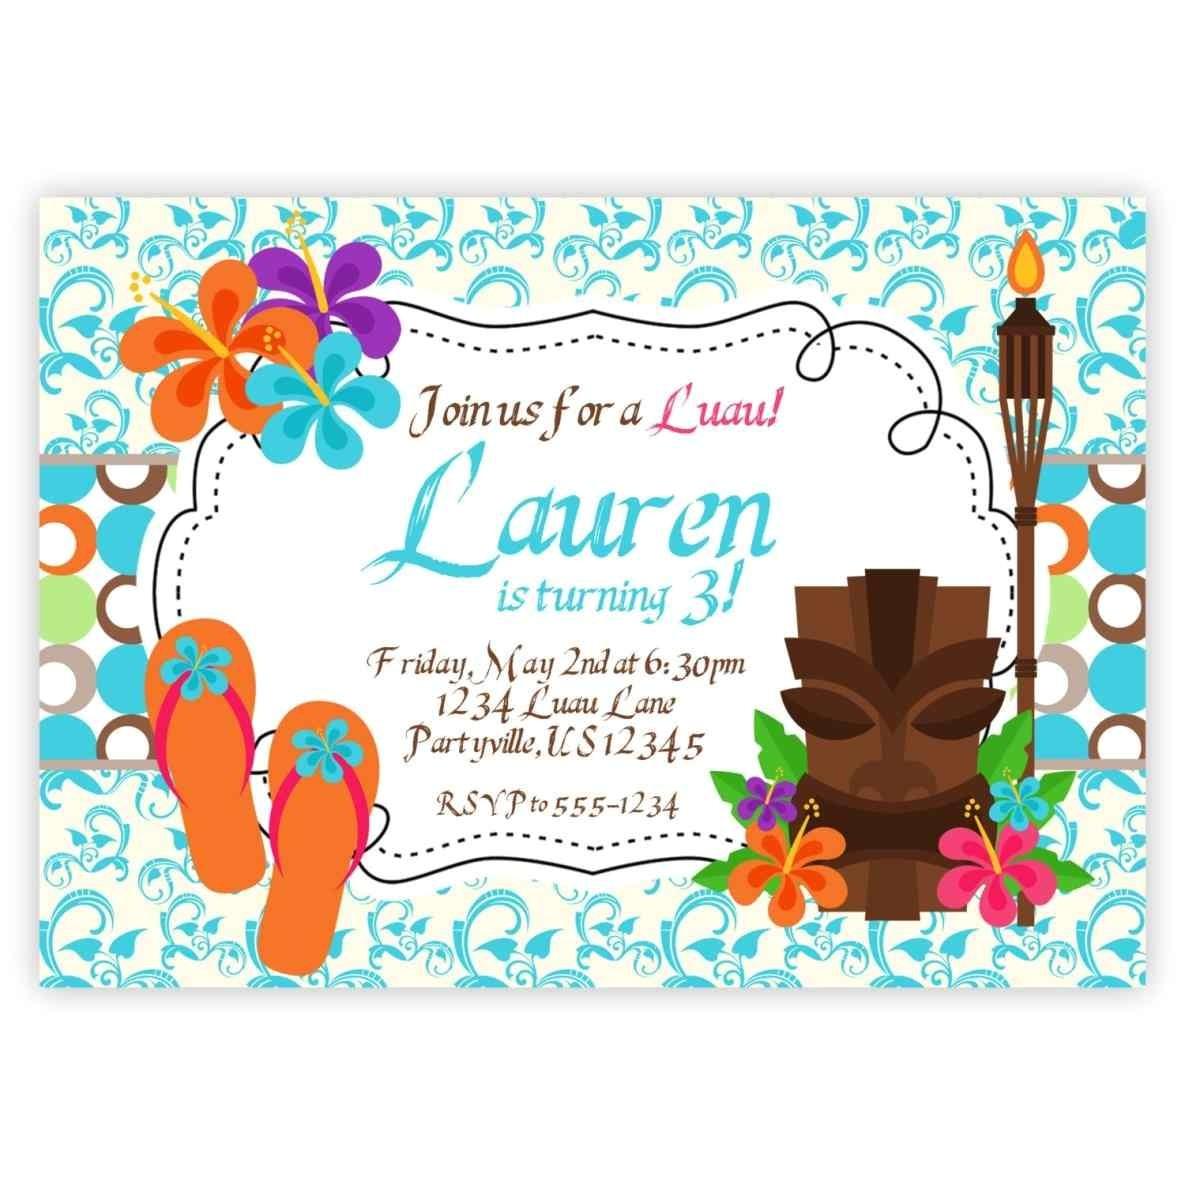 print at home diy invitation blank luau party invitations printable birthday little girl